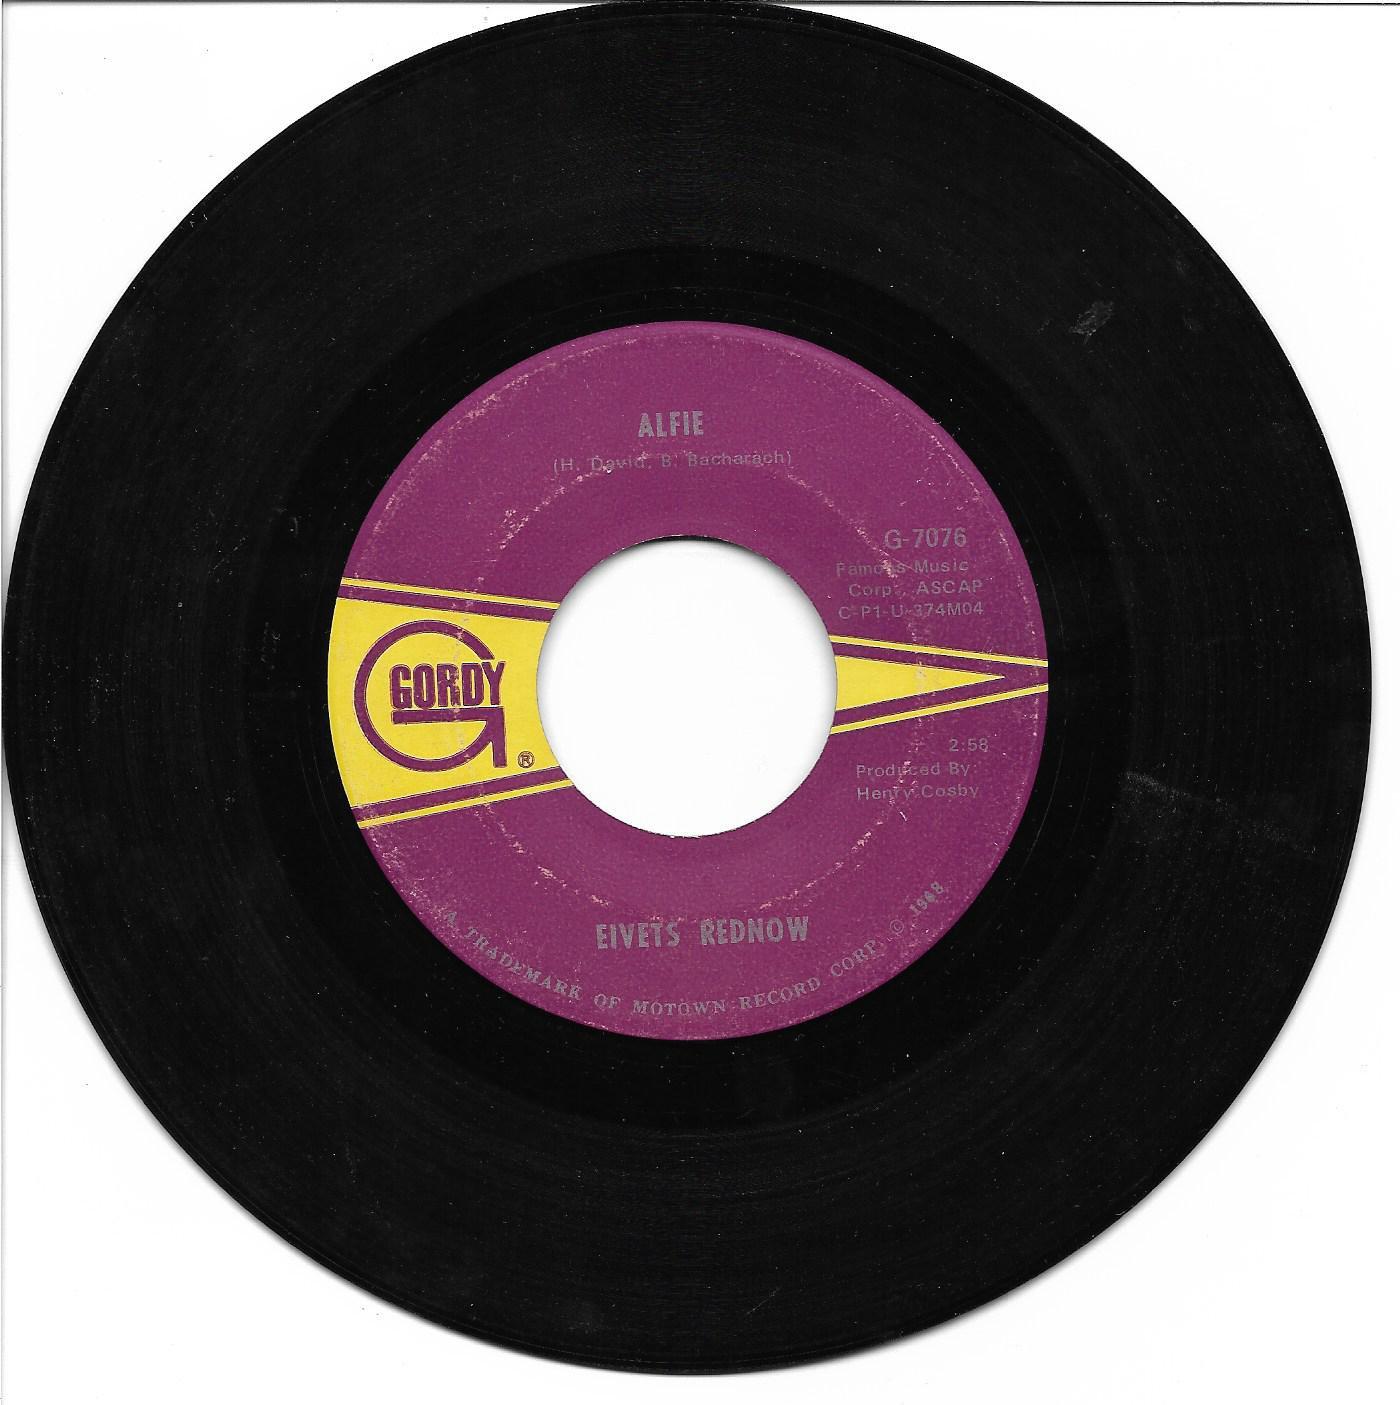 "Eivets Rednow (Stevie Wonder): ""Alfie"" / ""More Than A Dream"" - '67 - pl nicely!"